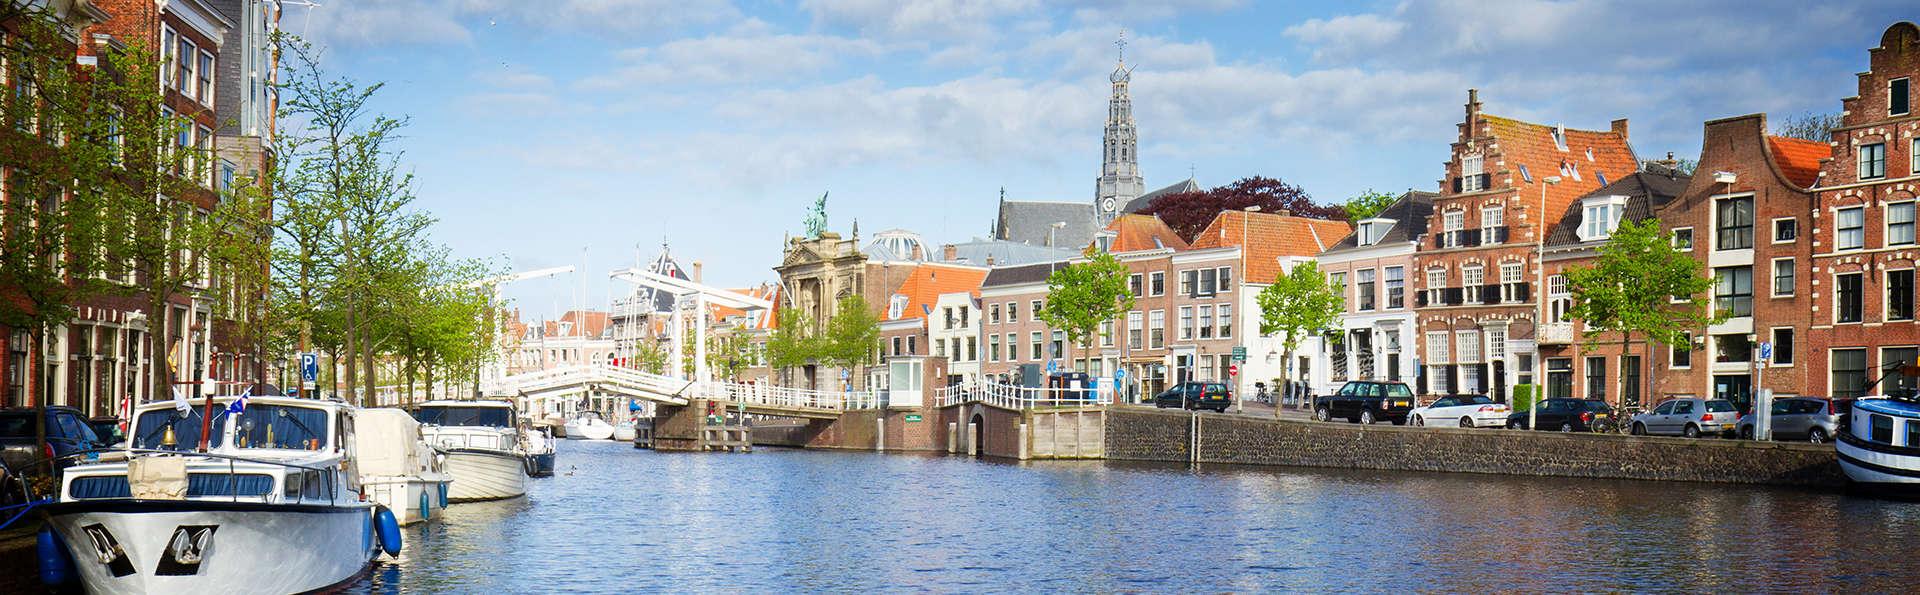 Van der Valk Hotel Haarlem - EDIT_harleem2.jpg